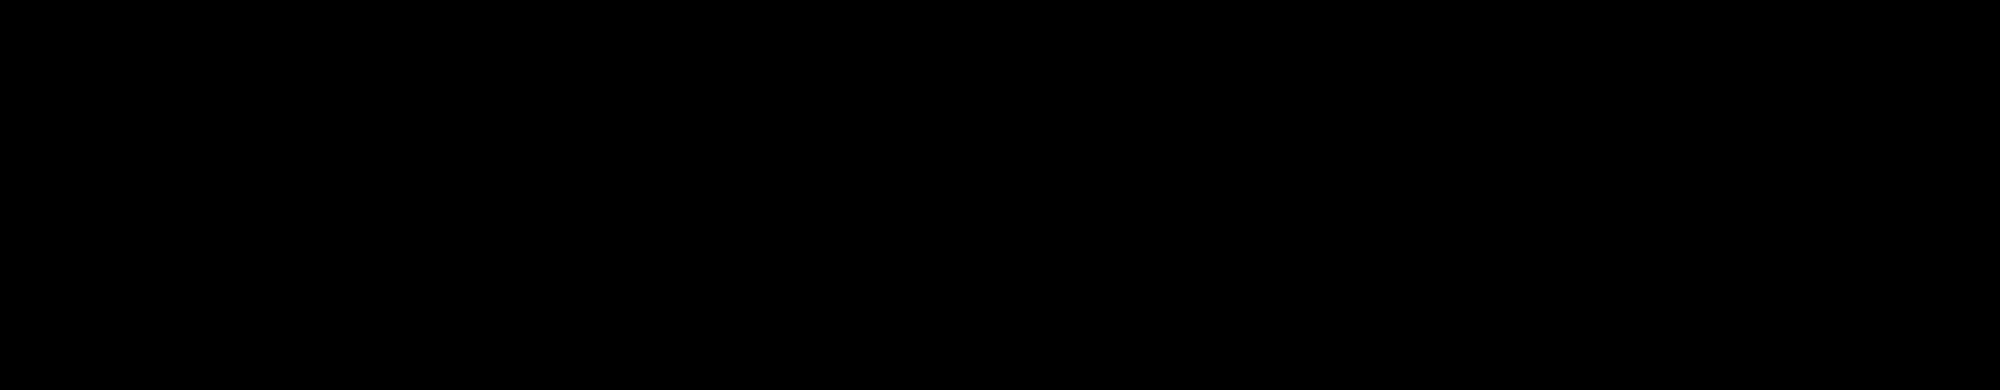 Juffali Industrial Product Company (JIPCO)